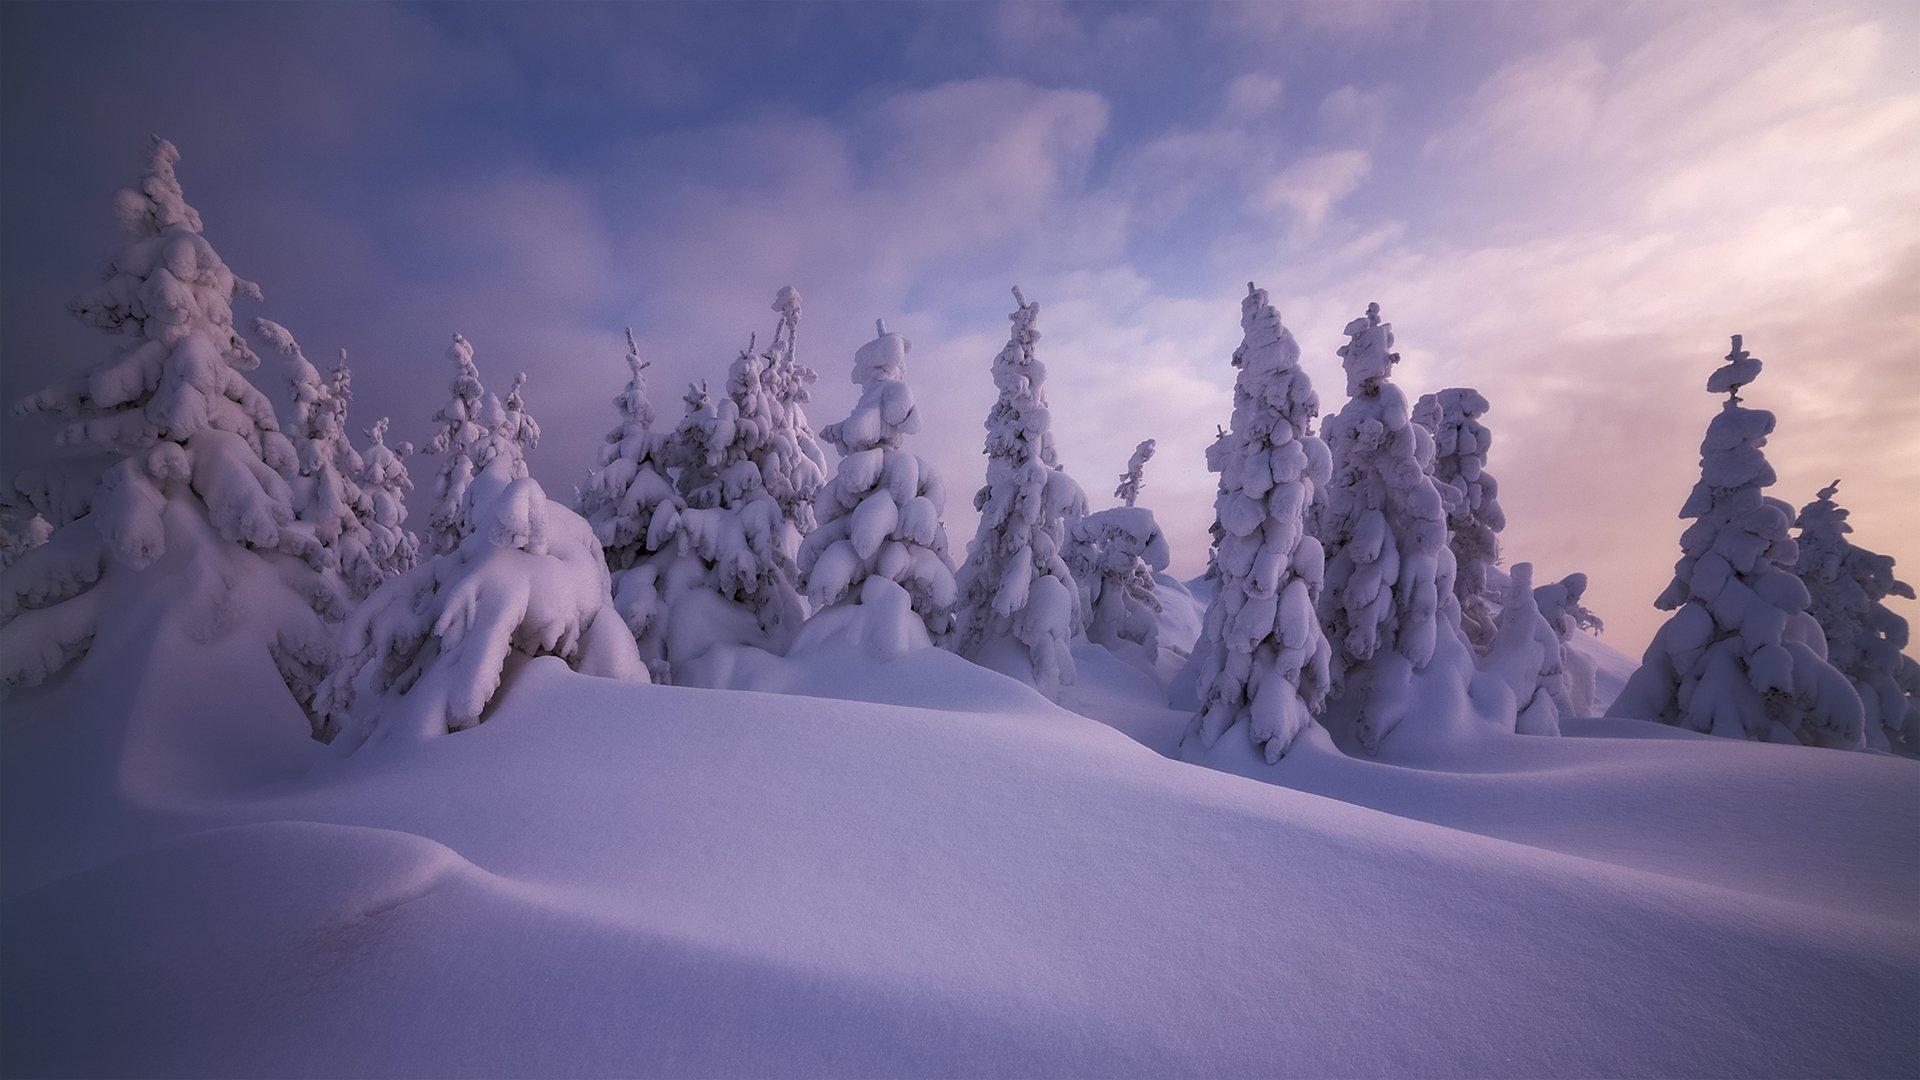 южный урал, зюраткуль, зимняя сказка, marateaman